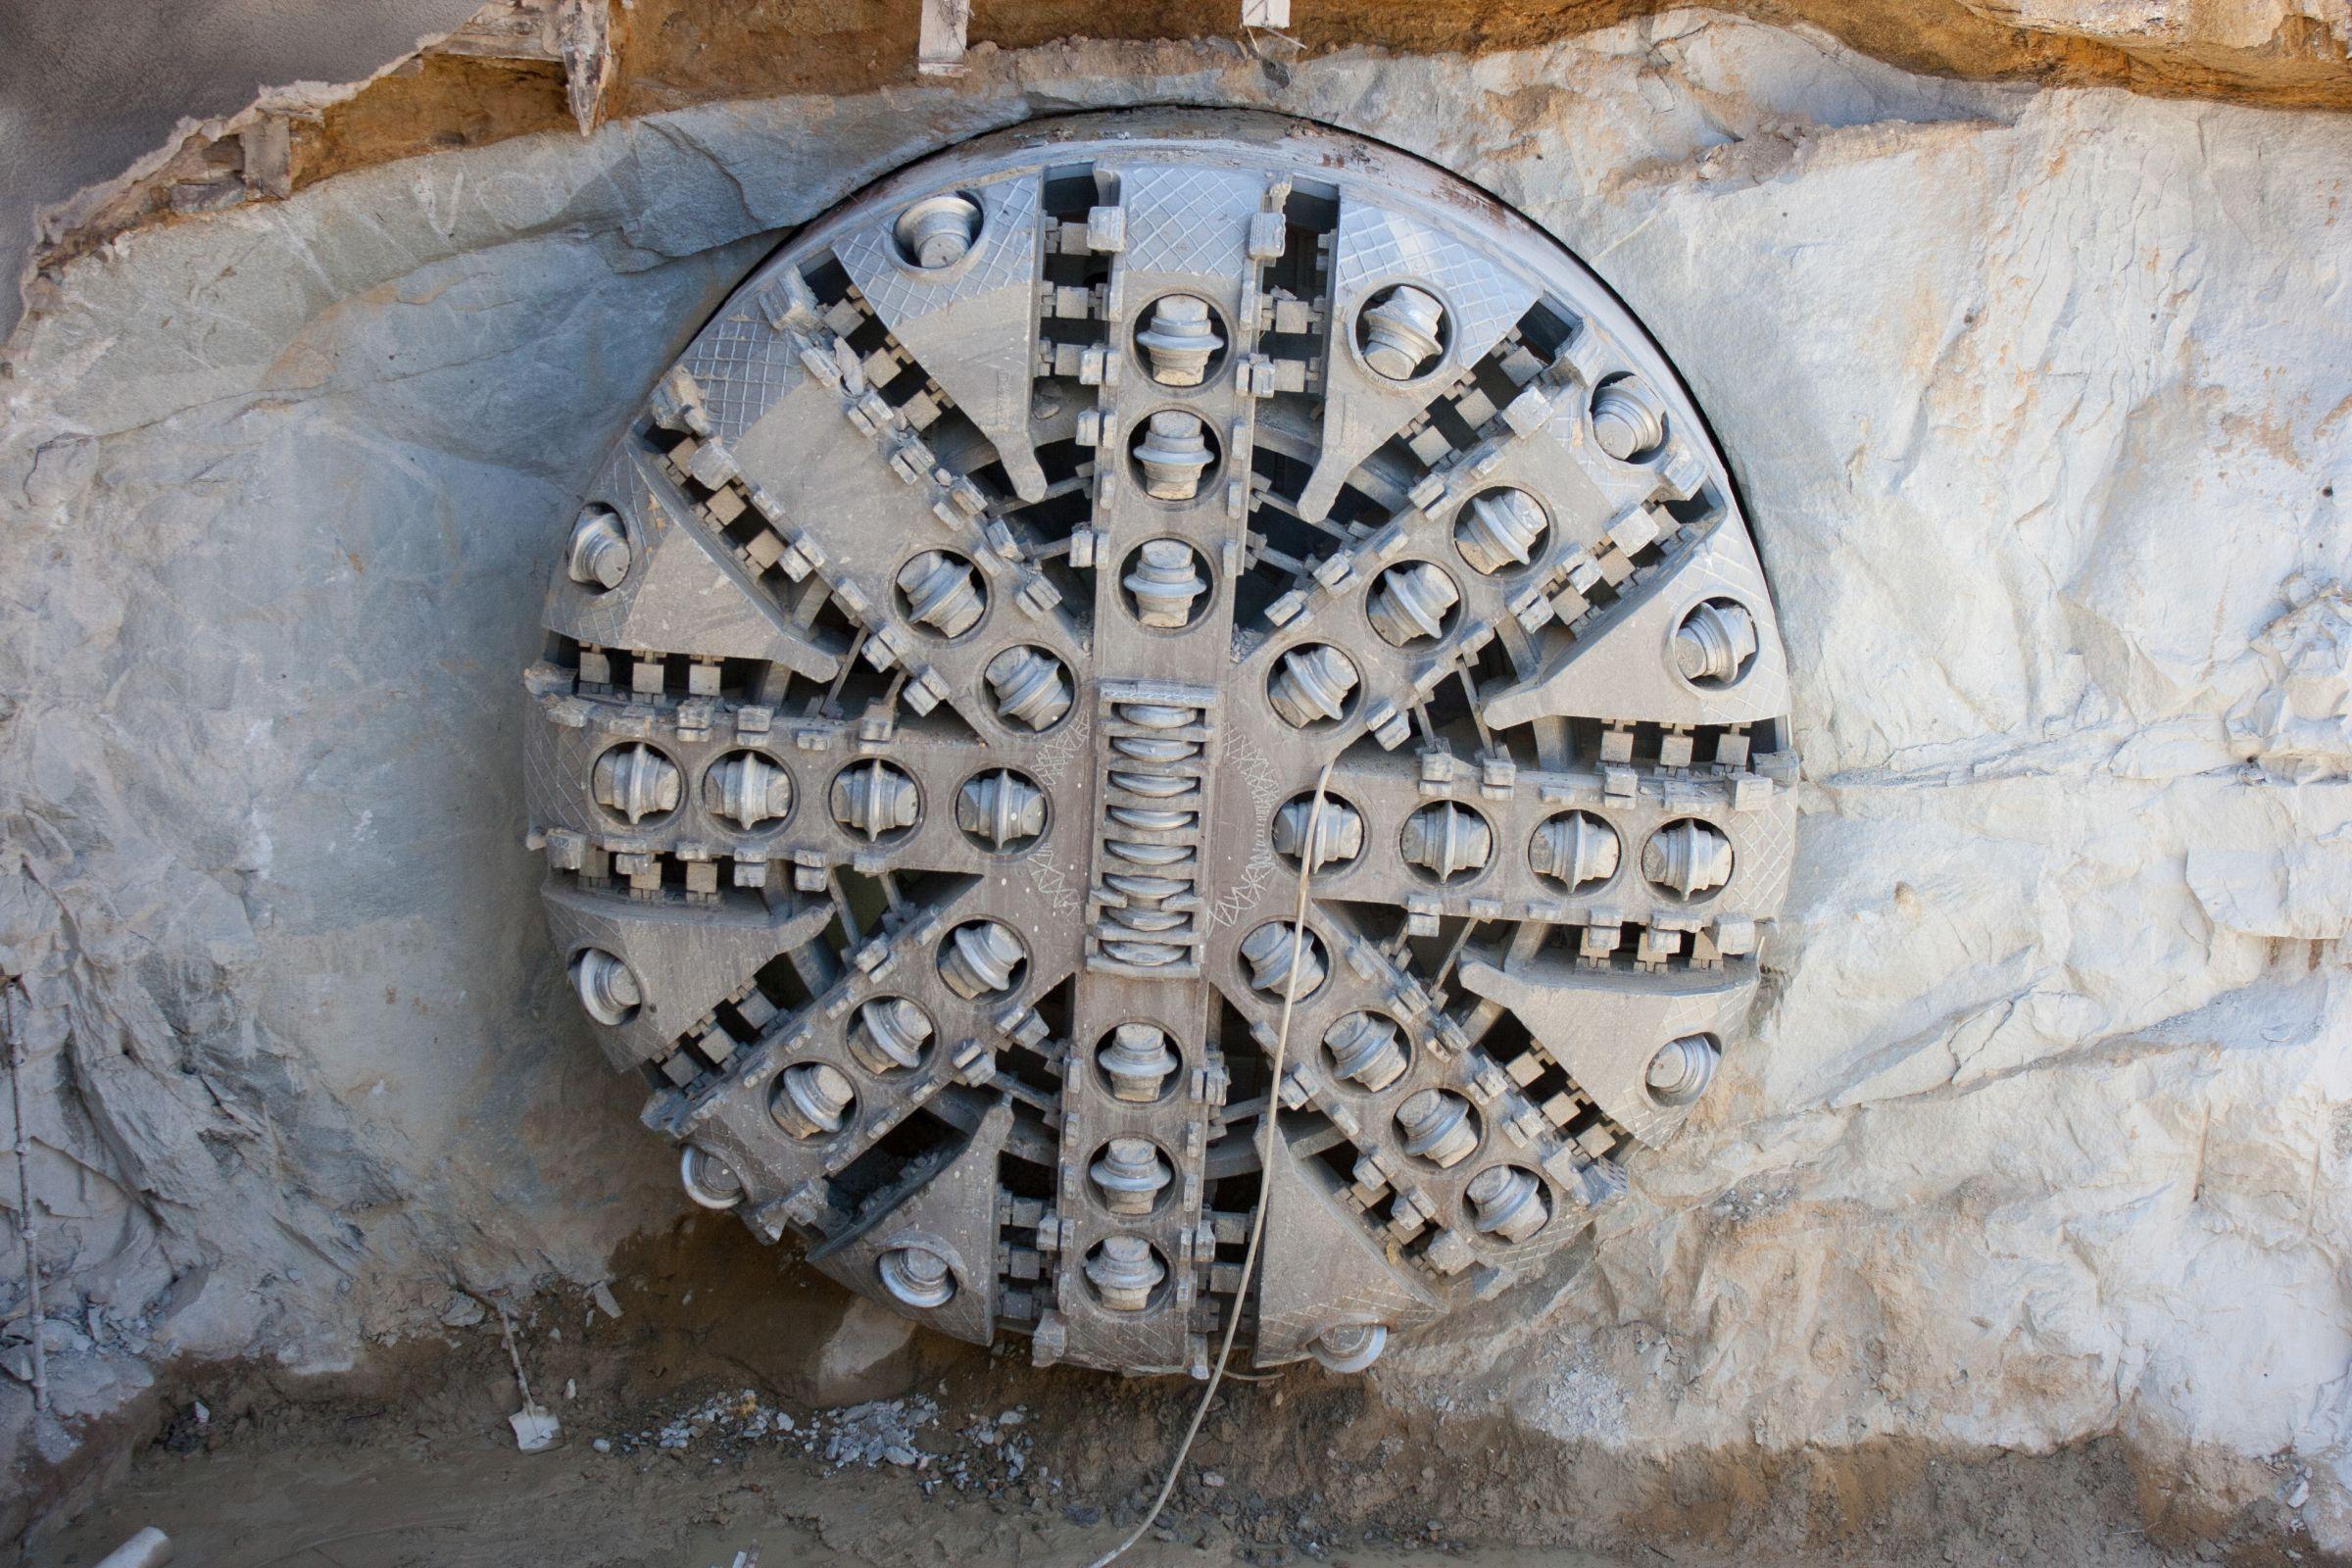 strojevi za bušenje tunela